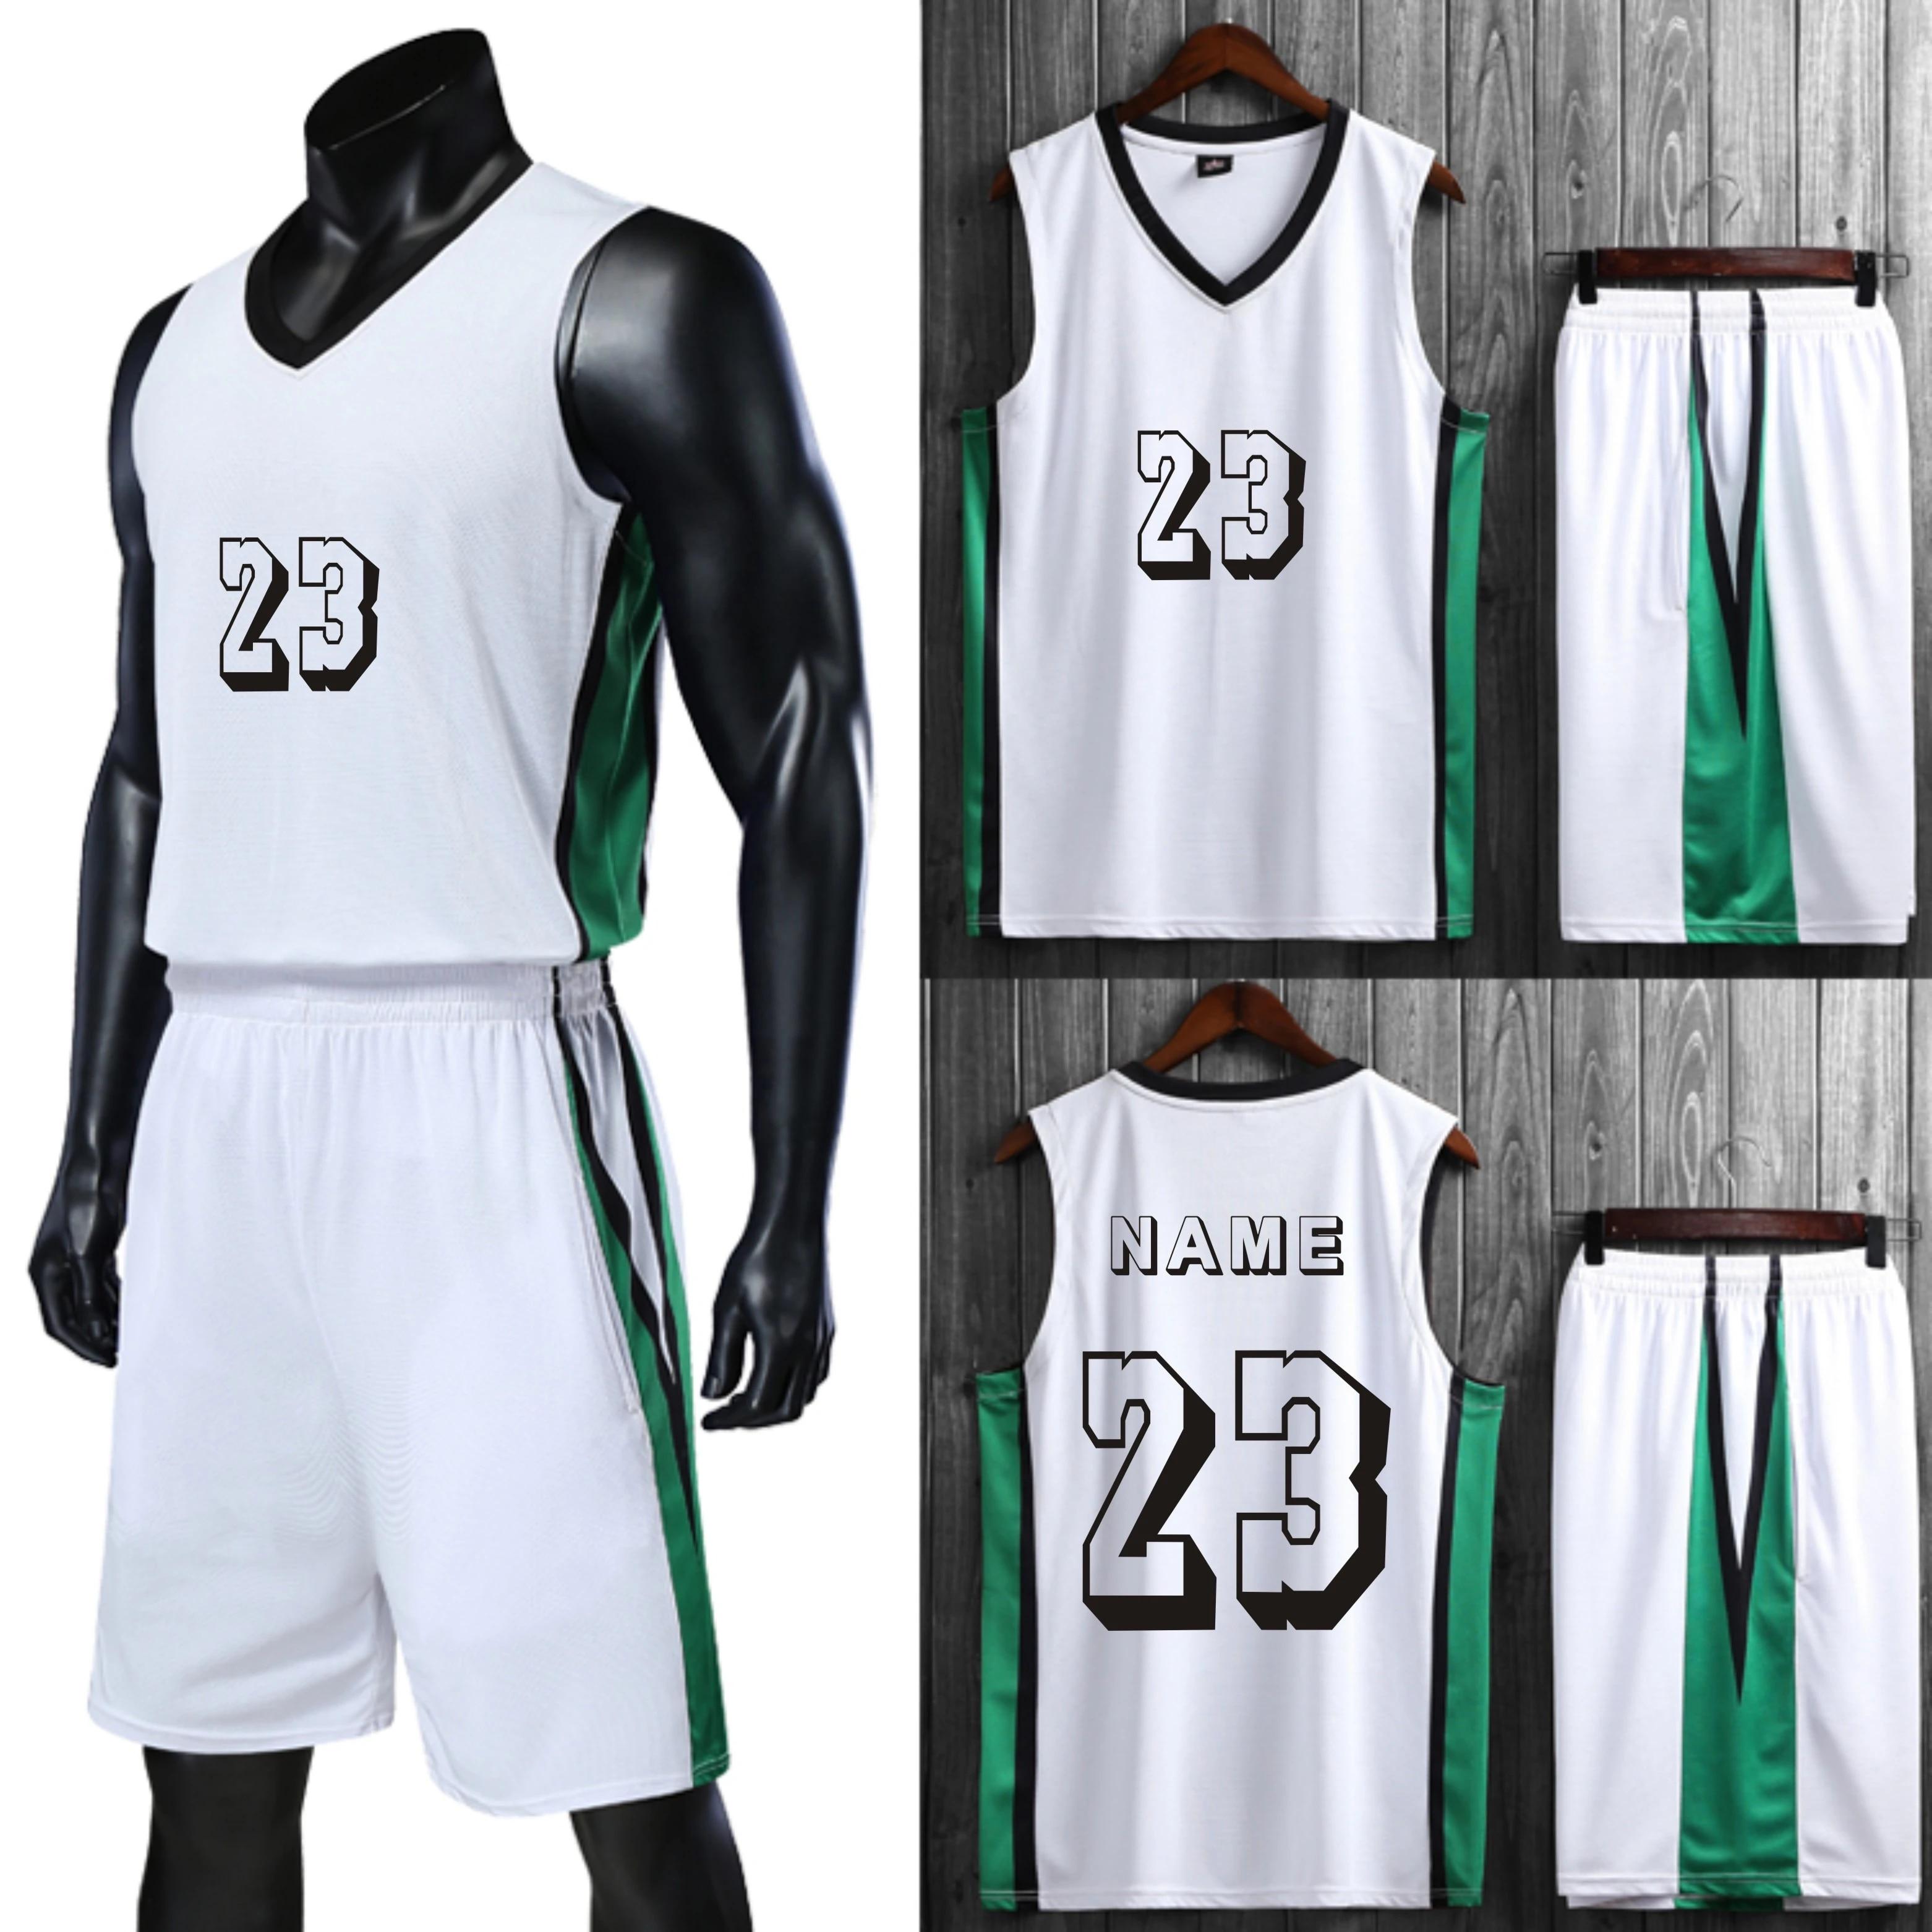 where can i get cheap jerseys